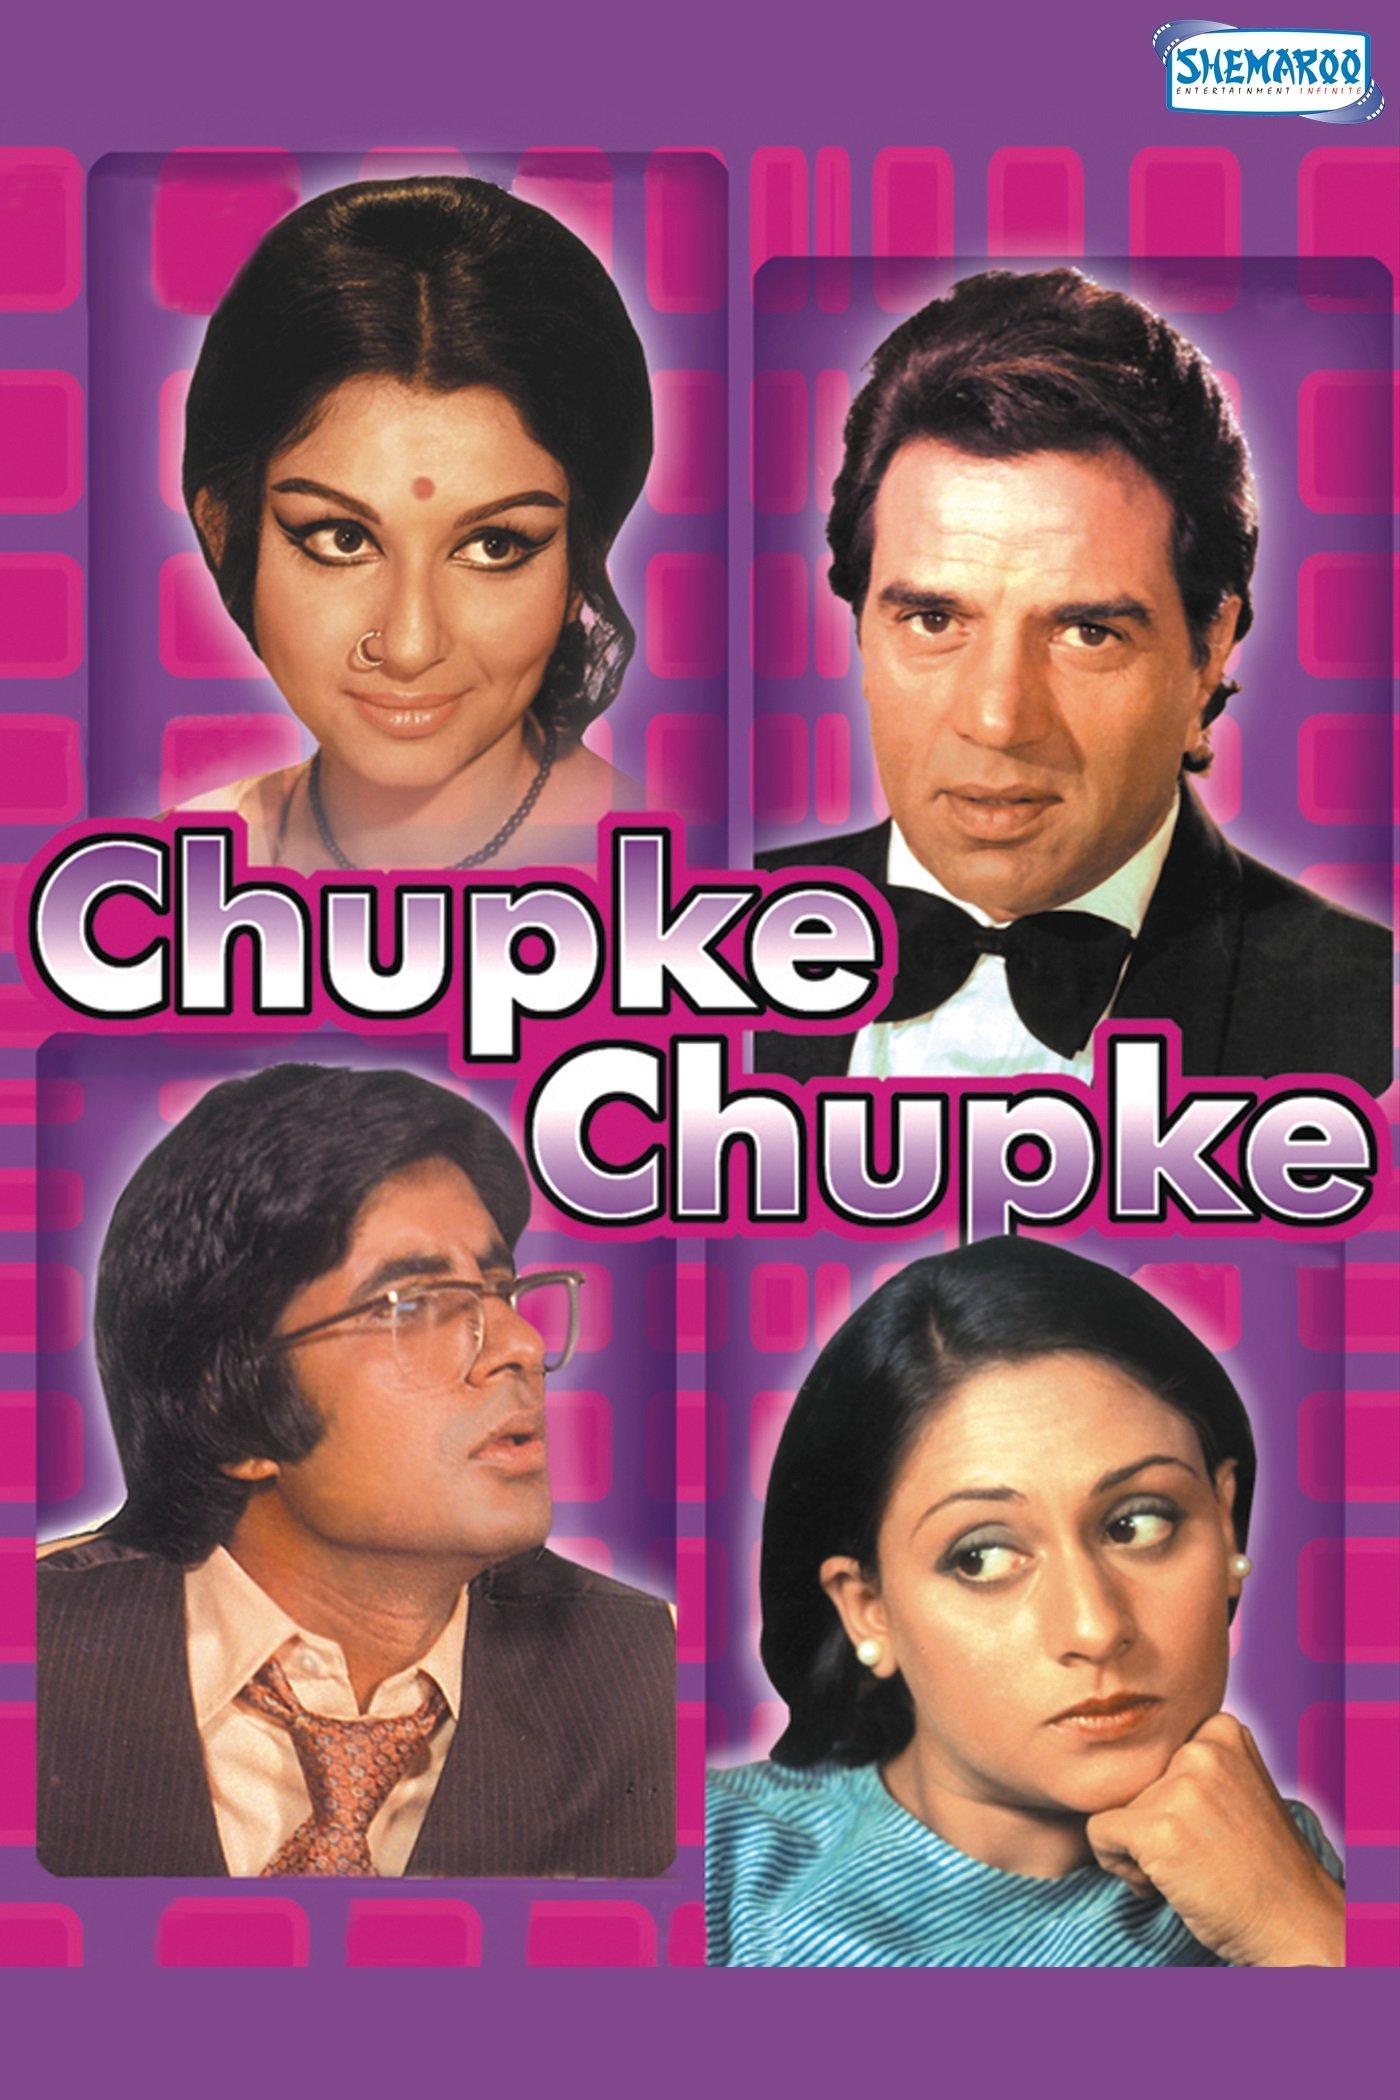 Photo Credit http://www.freewatchonlinebollywoodmovies.com/2015/03/chupke-chupke-1975-watch-download-online.html